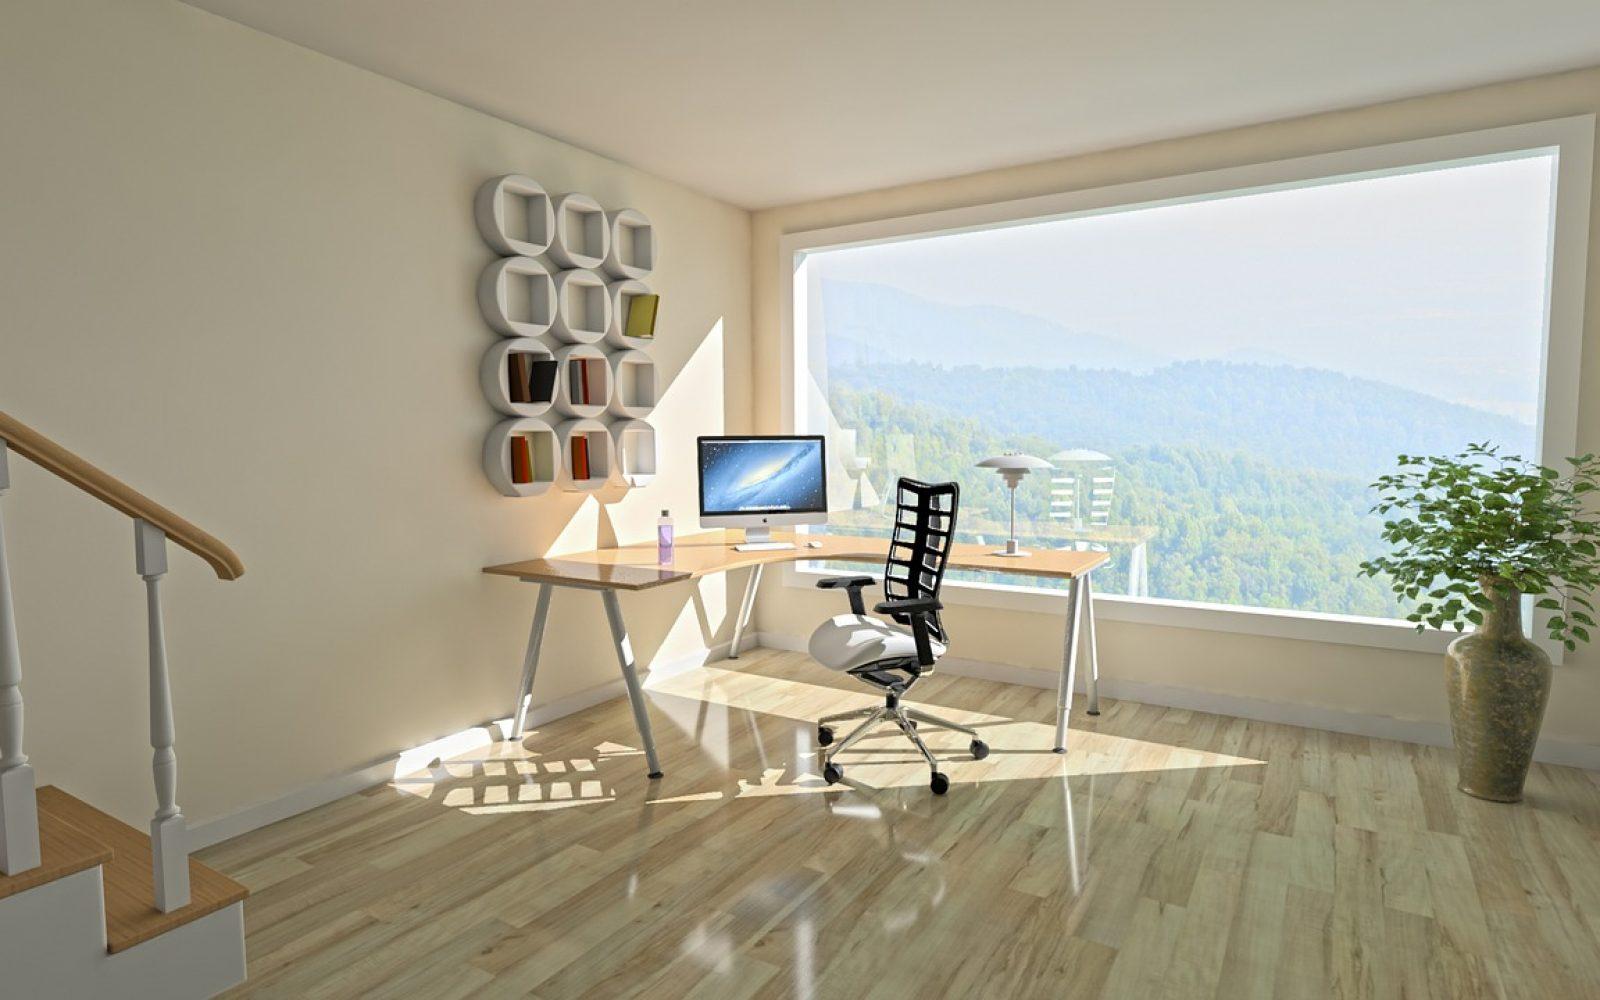 stanovanje čisto narava okno